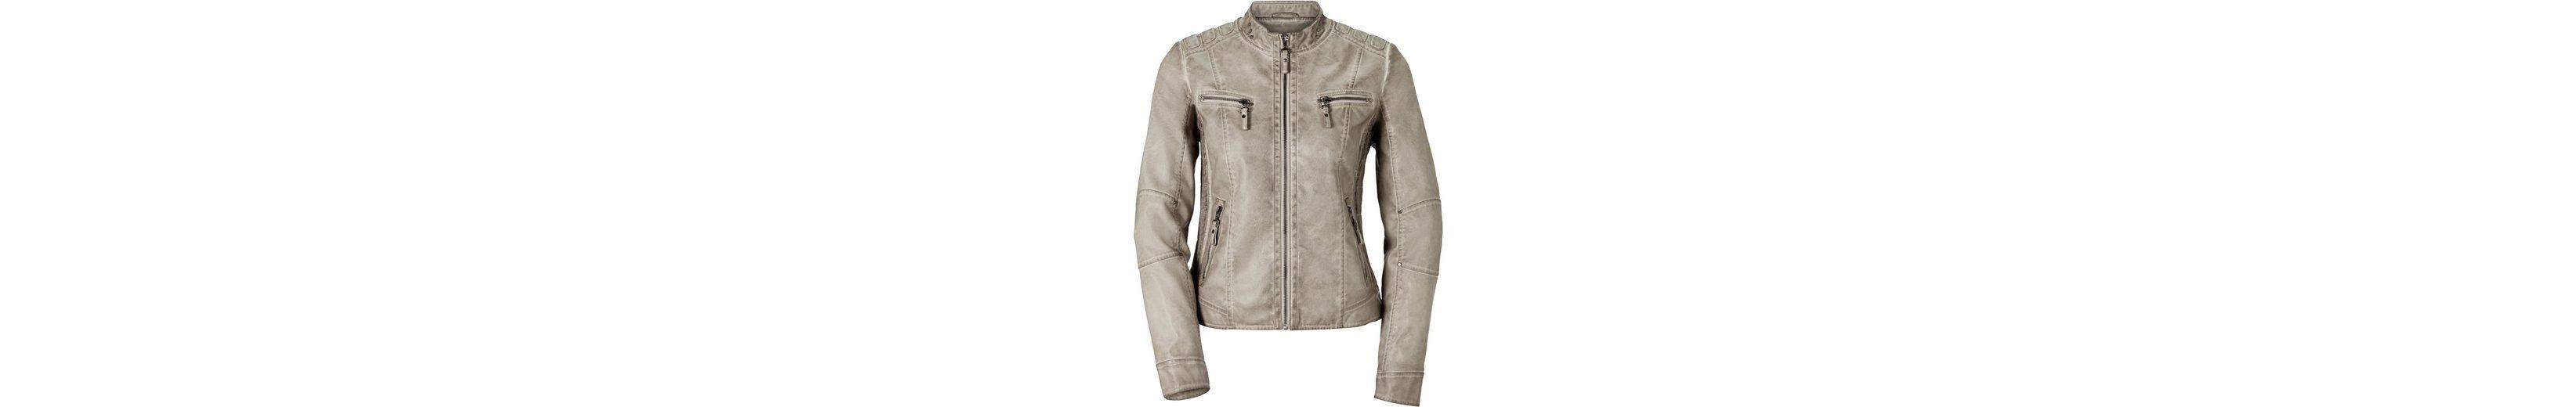 Großhandelspreis Günstig Online Billig 2018 Neueste Mainpol Jacke im Biker-Stil mRZZ3